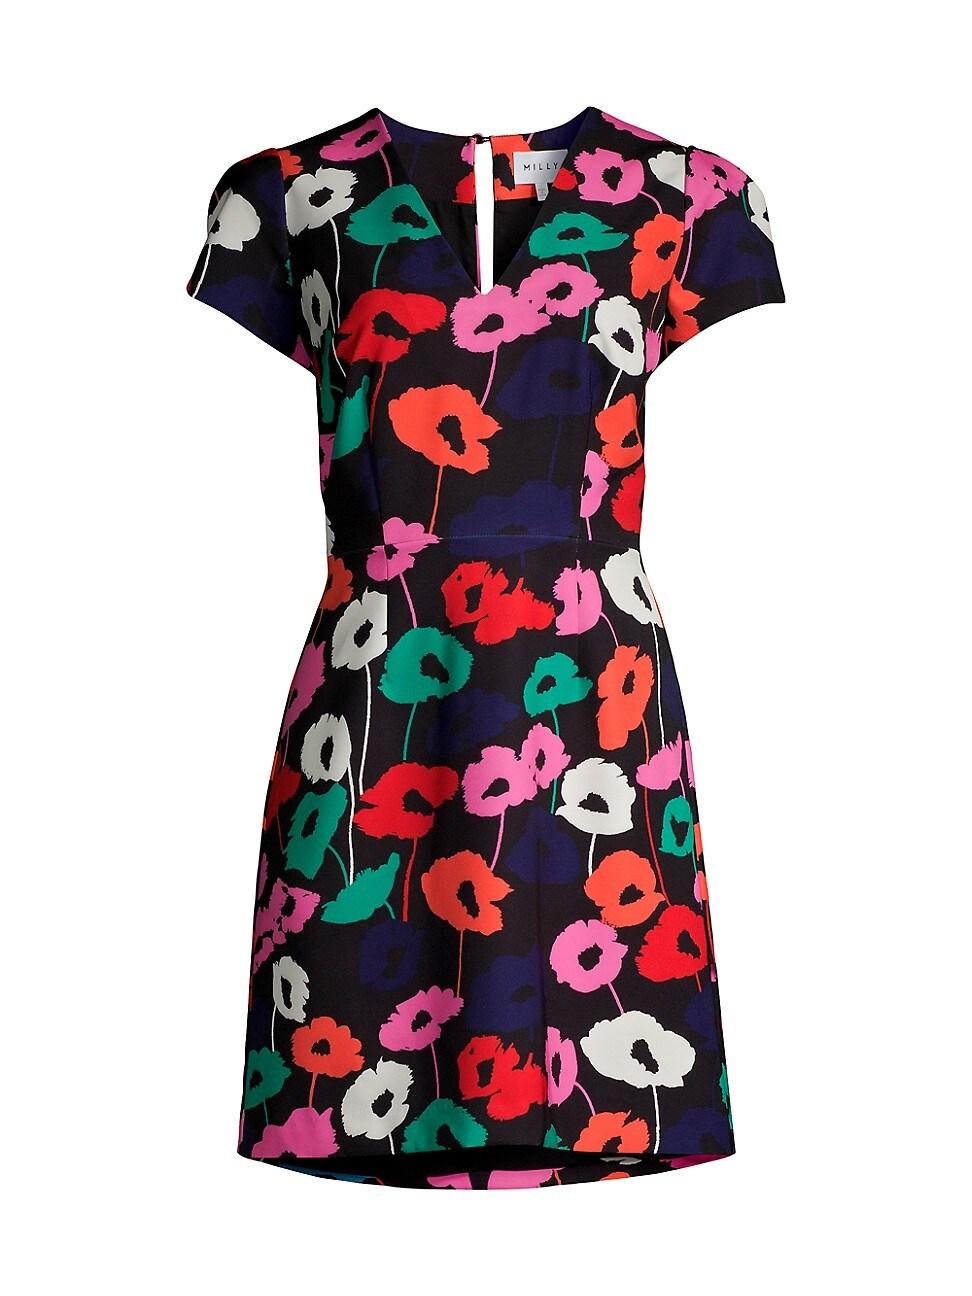 Milly Dresses WOMEN'S ATALIE POPPY PRINT SHEATH DRESS